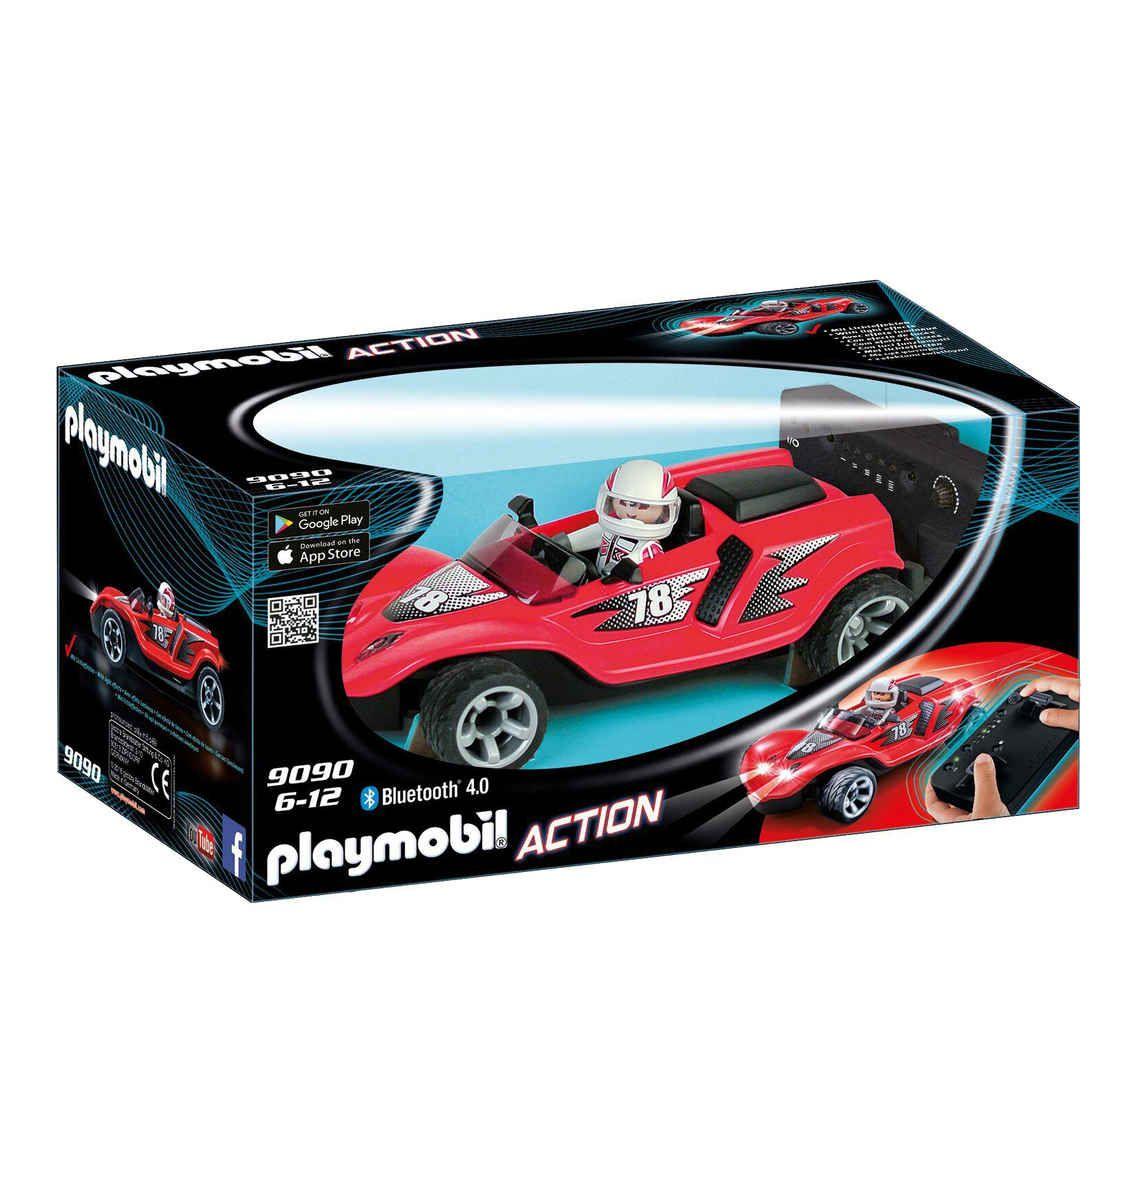 Playmobil Rocket Racer 9090 bei Galeria Kaufhof Online durch 13% auf Playmobil & weitere Playmobil-Angebote